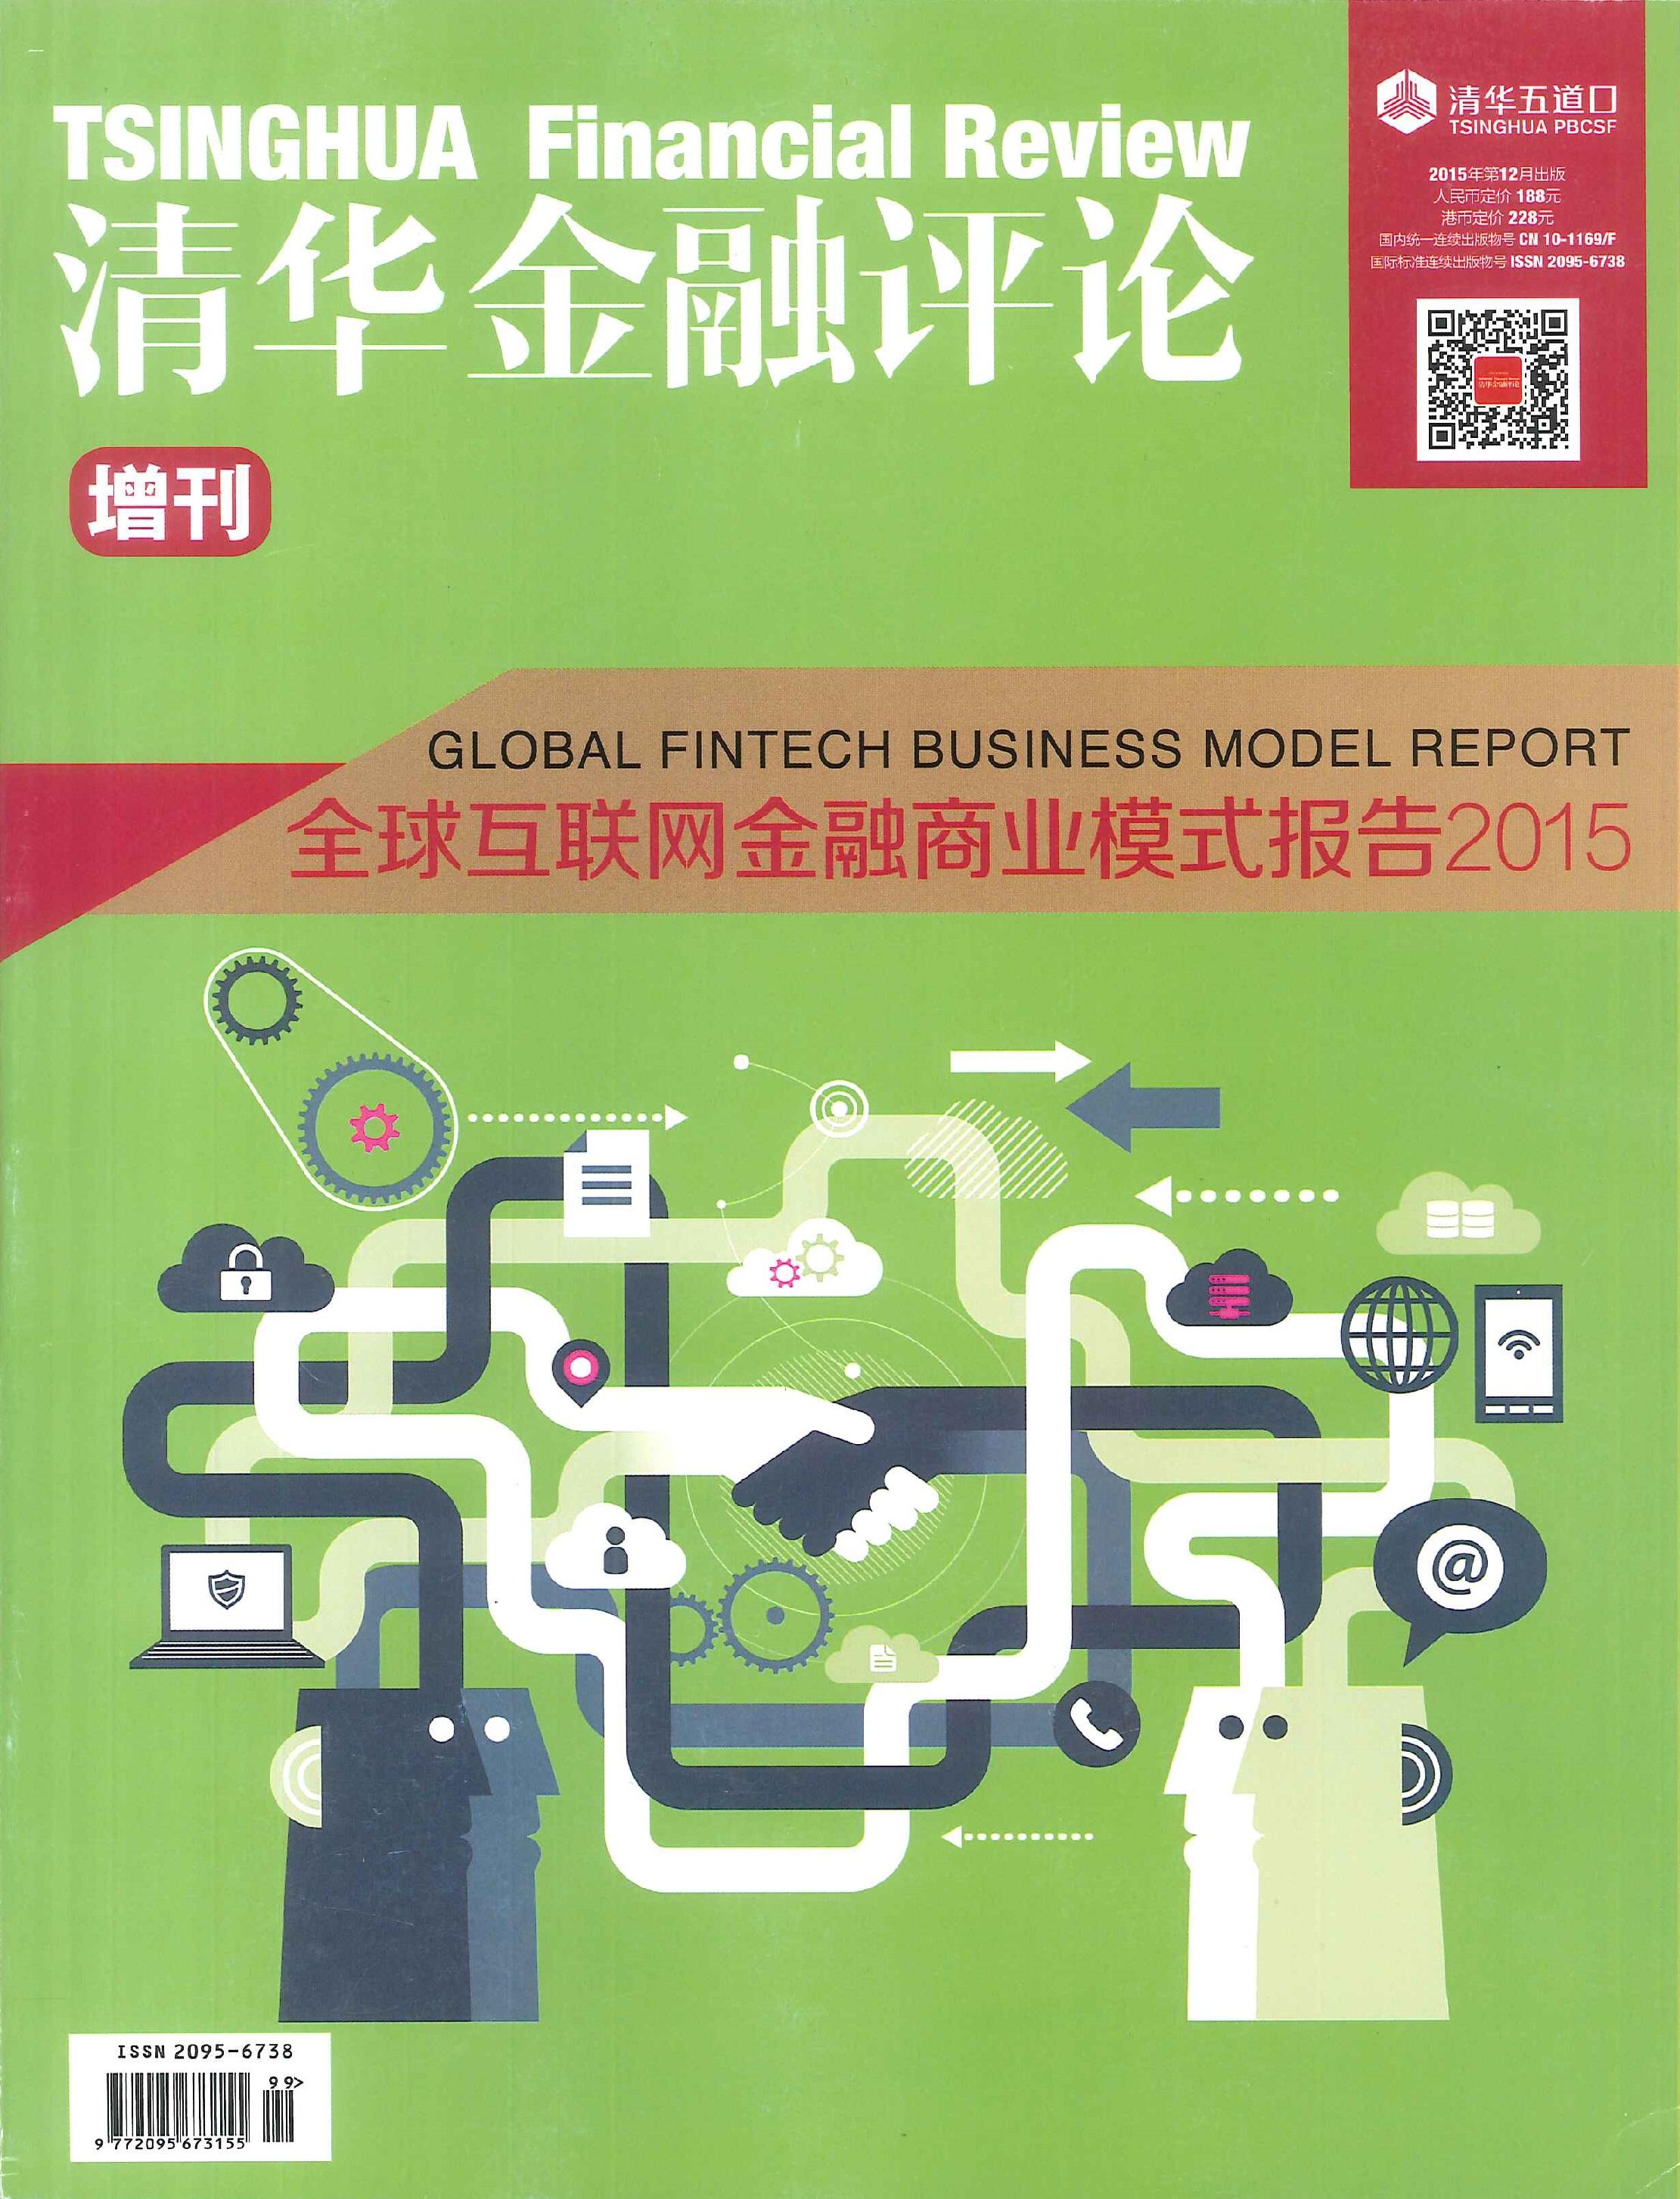 全球互联网金融商业模式报告.2015=Global fintech business model report